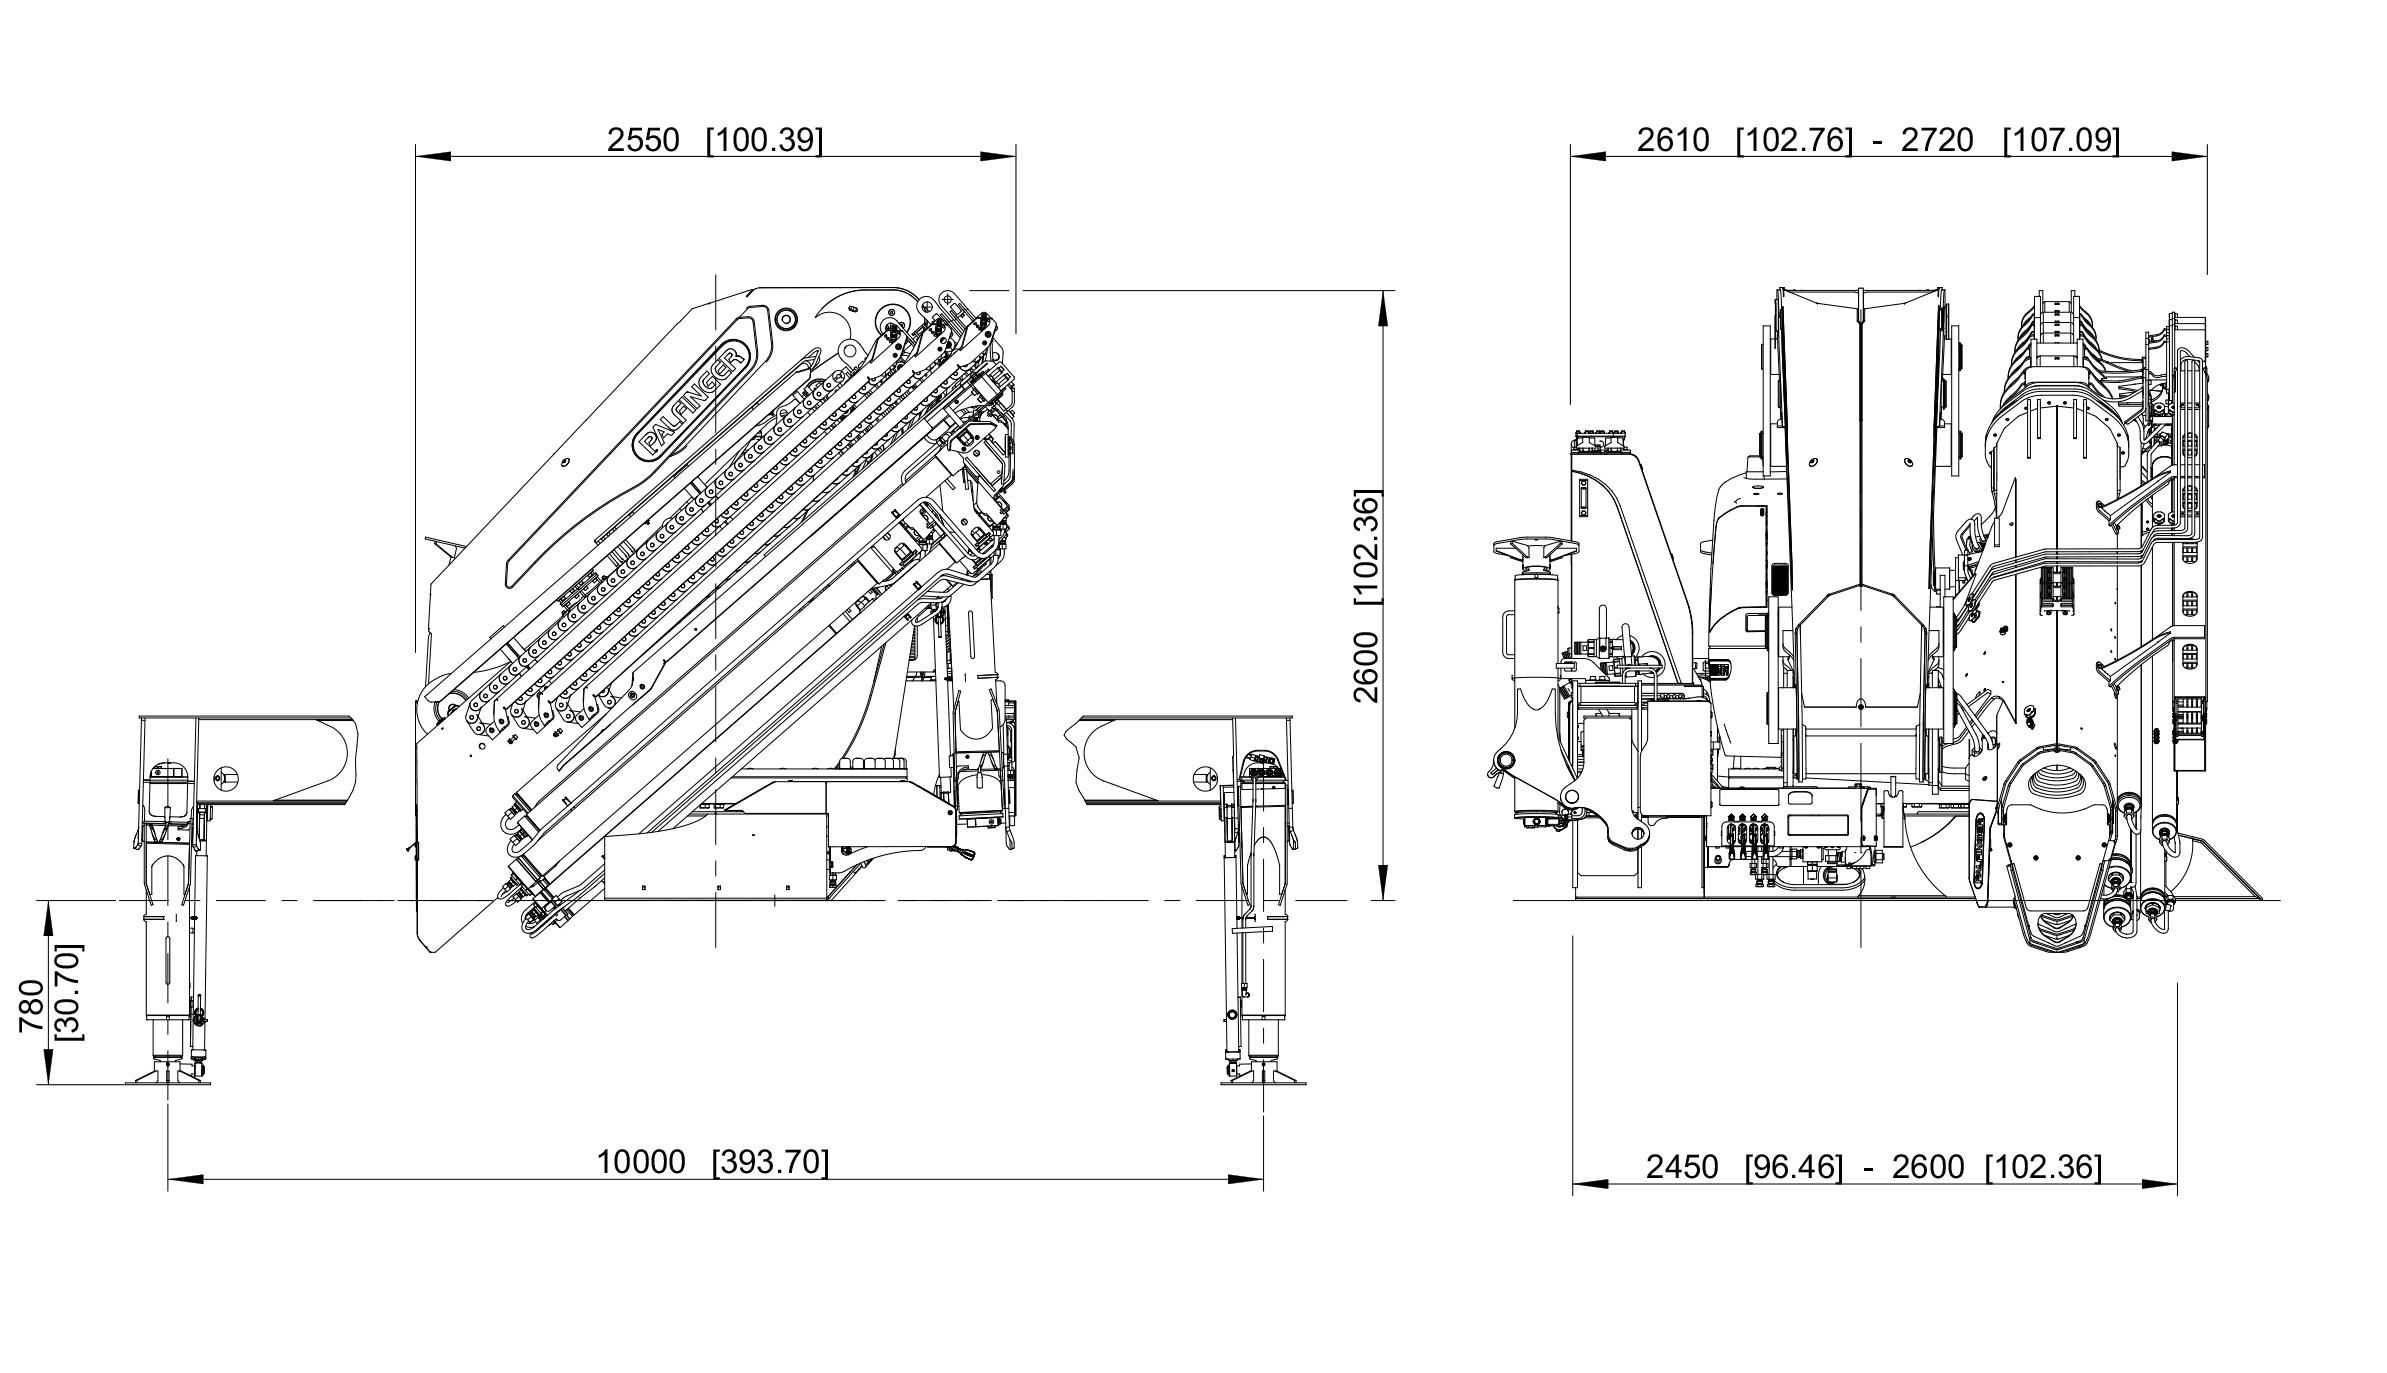 Wiring Diagram Moreover Overhead Crane Hoist Brake Wiring Diagram